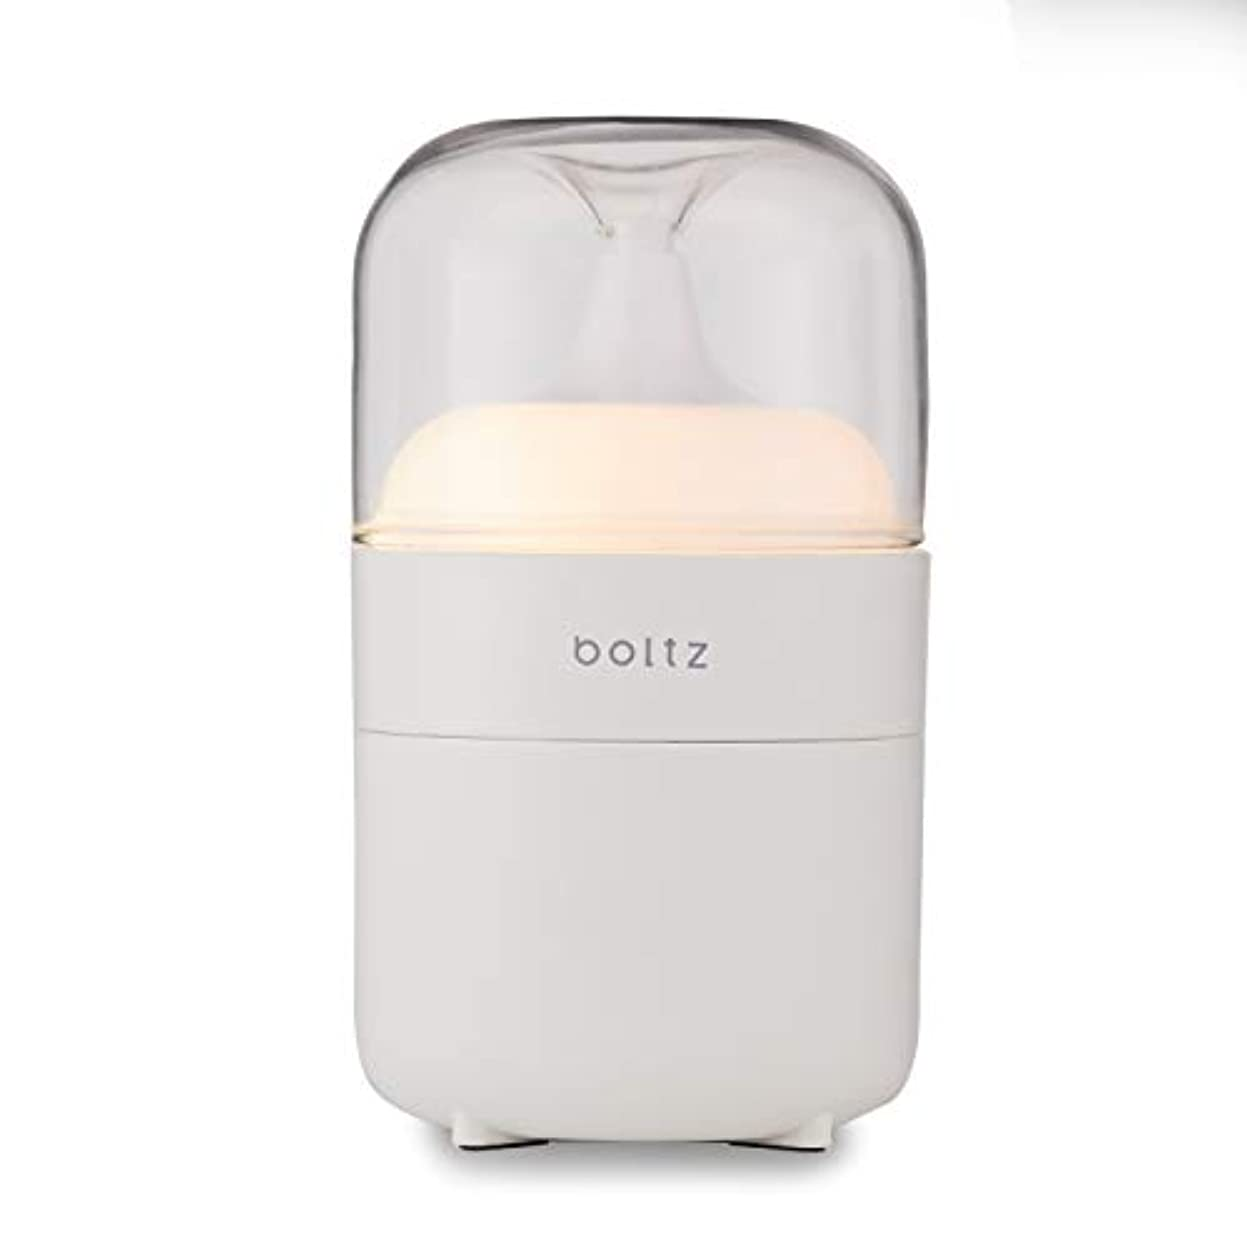 LOWYA boltz アロマディフューザー ネプライザー式 アロマオイル対応 間接照明 おしゃれ USB対応